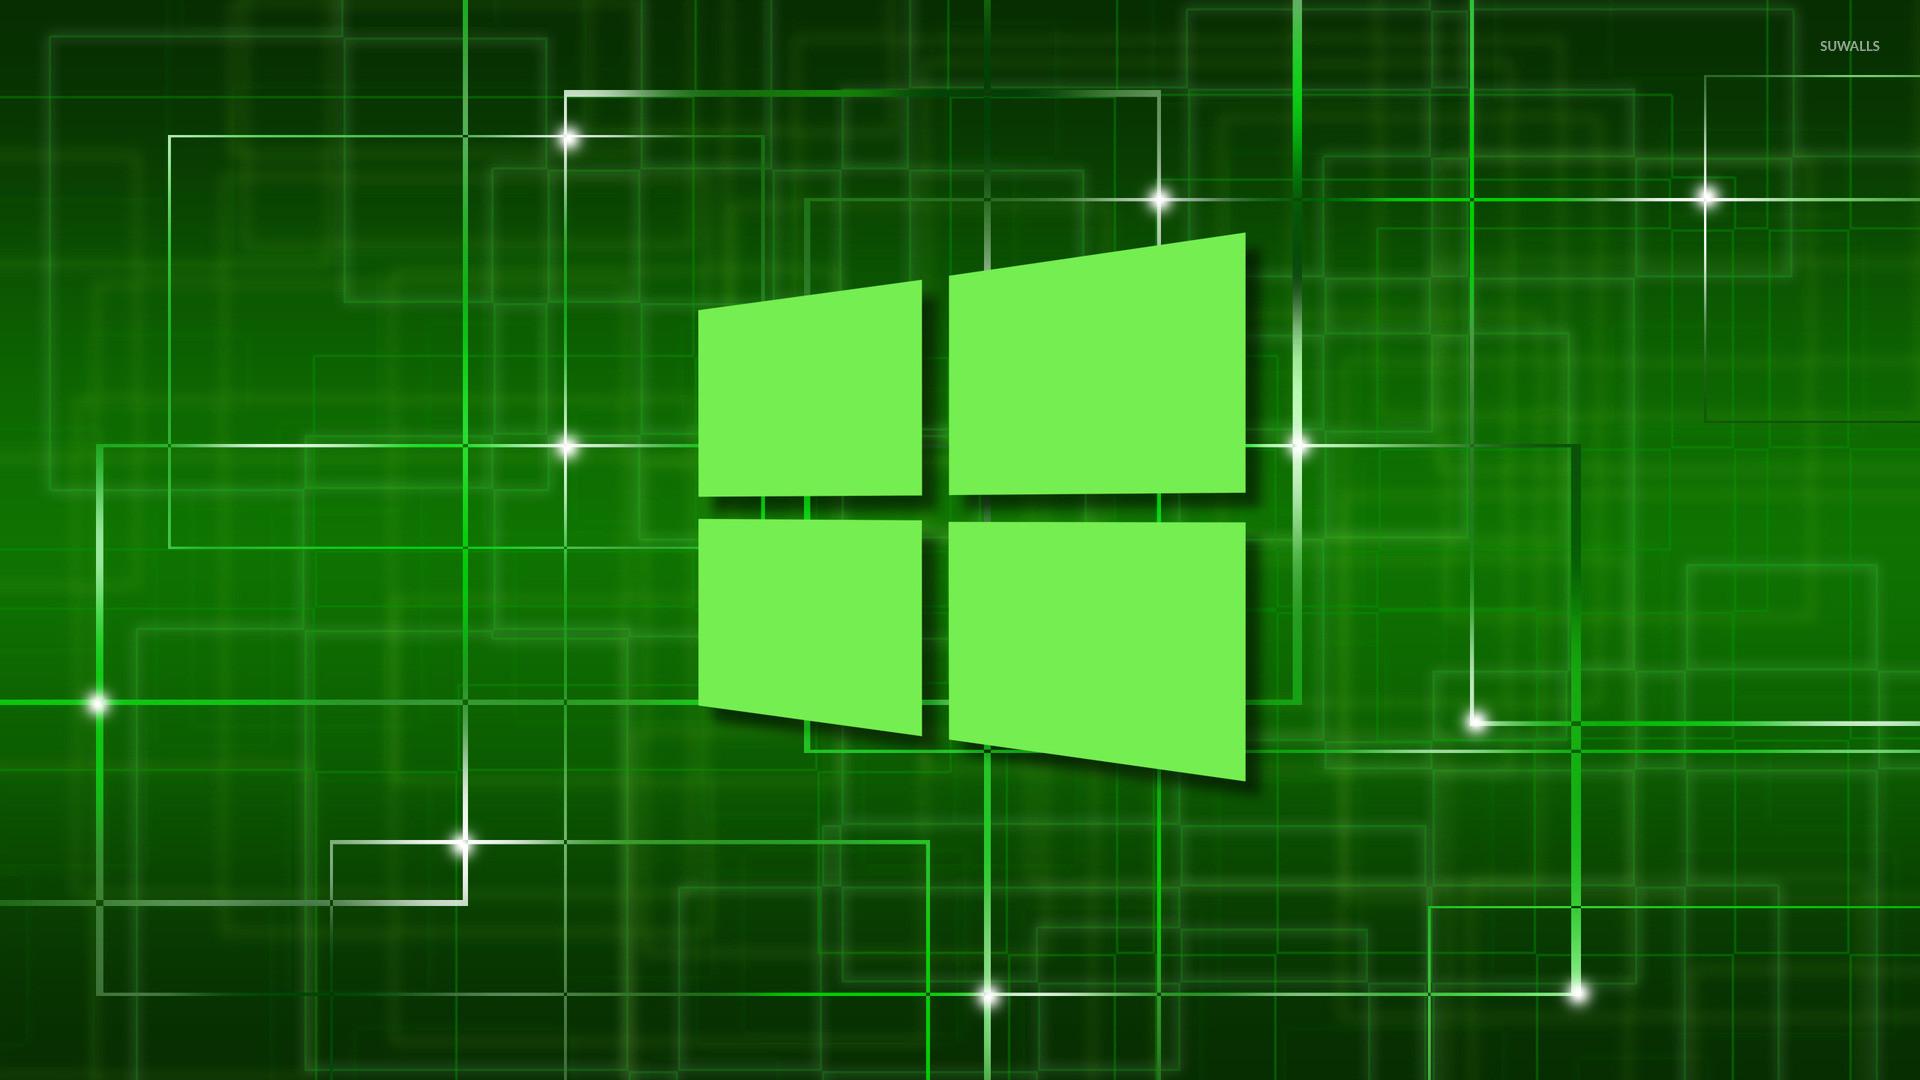 Windows 10 green simple logo on a network wallpaper – Computer .